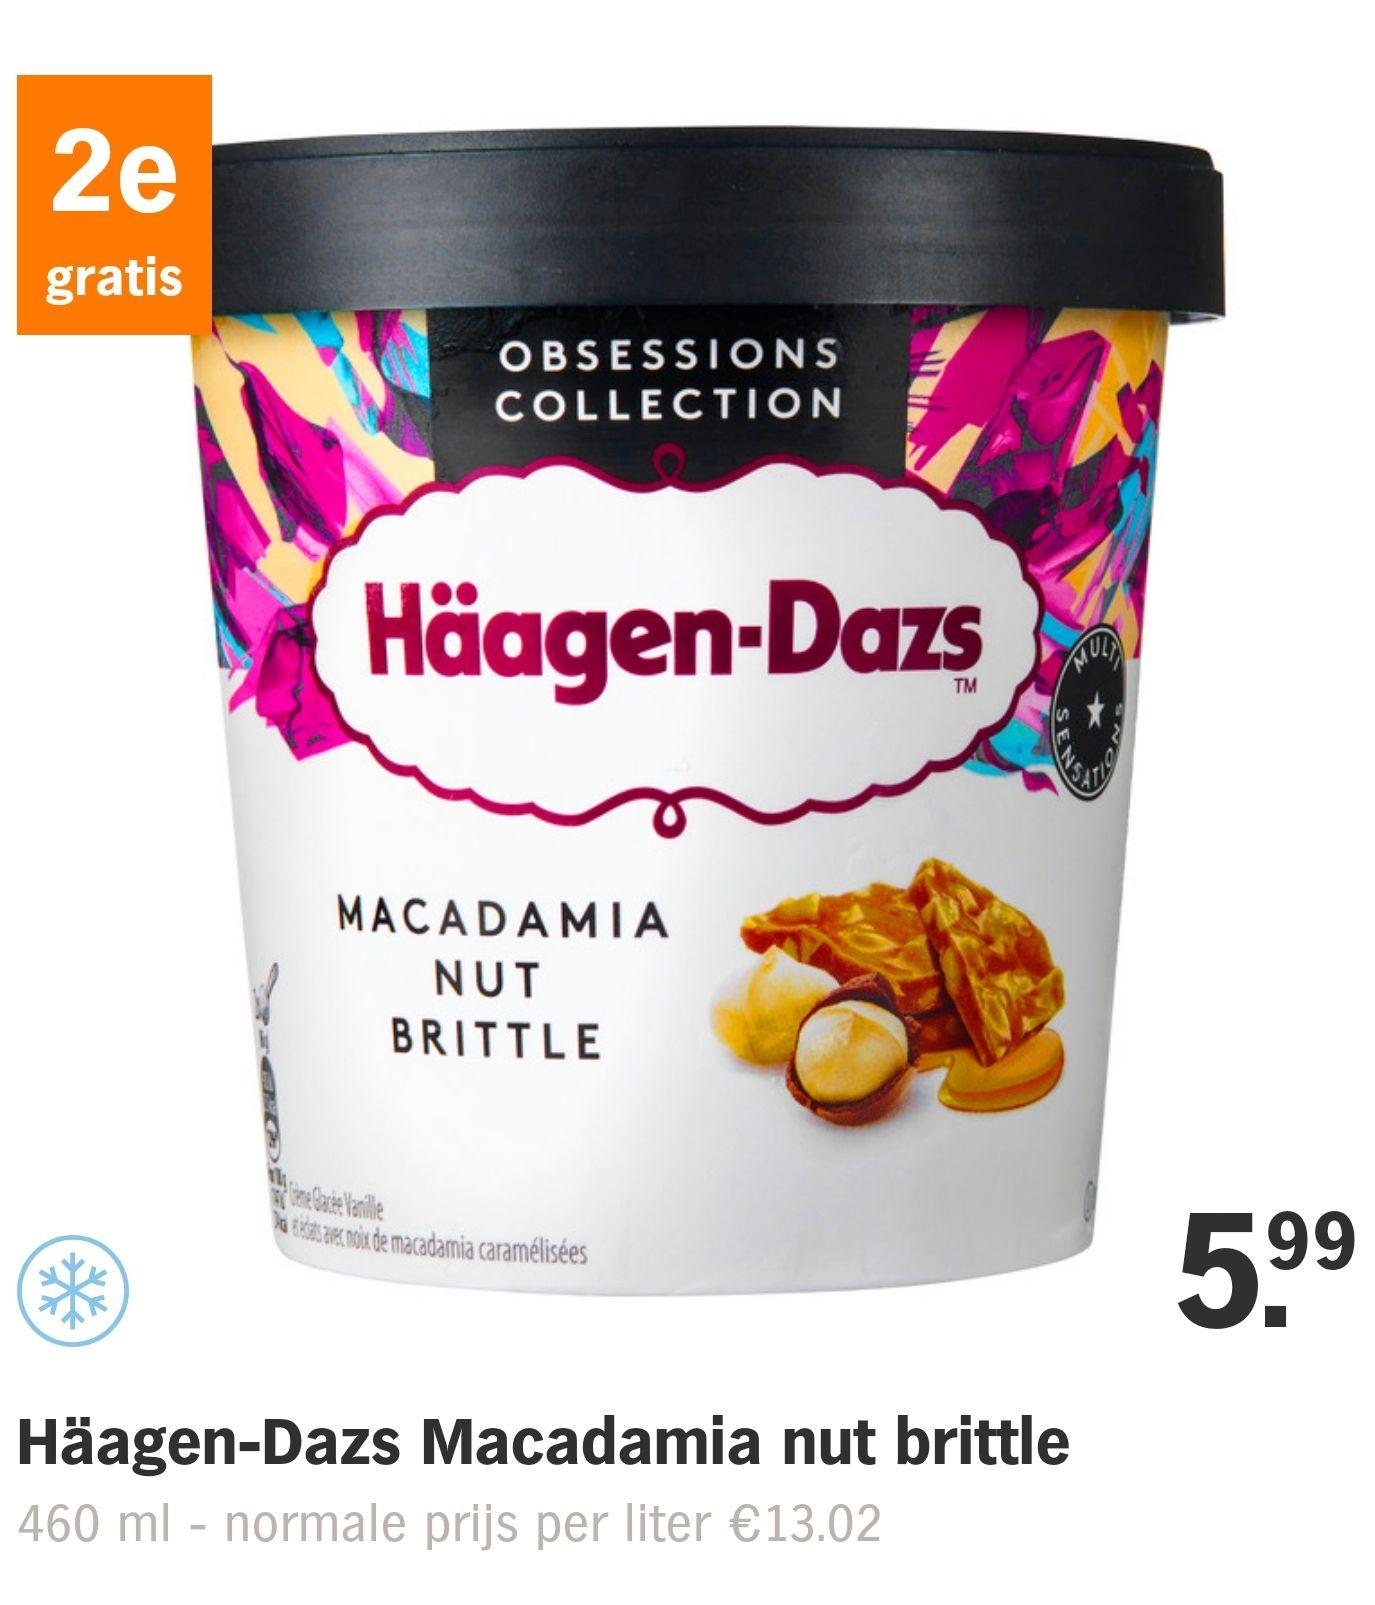 AH - Häagen Dazs ijs 2e gratis. €5,99 per 2 stuks.